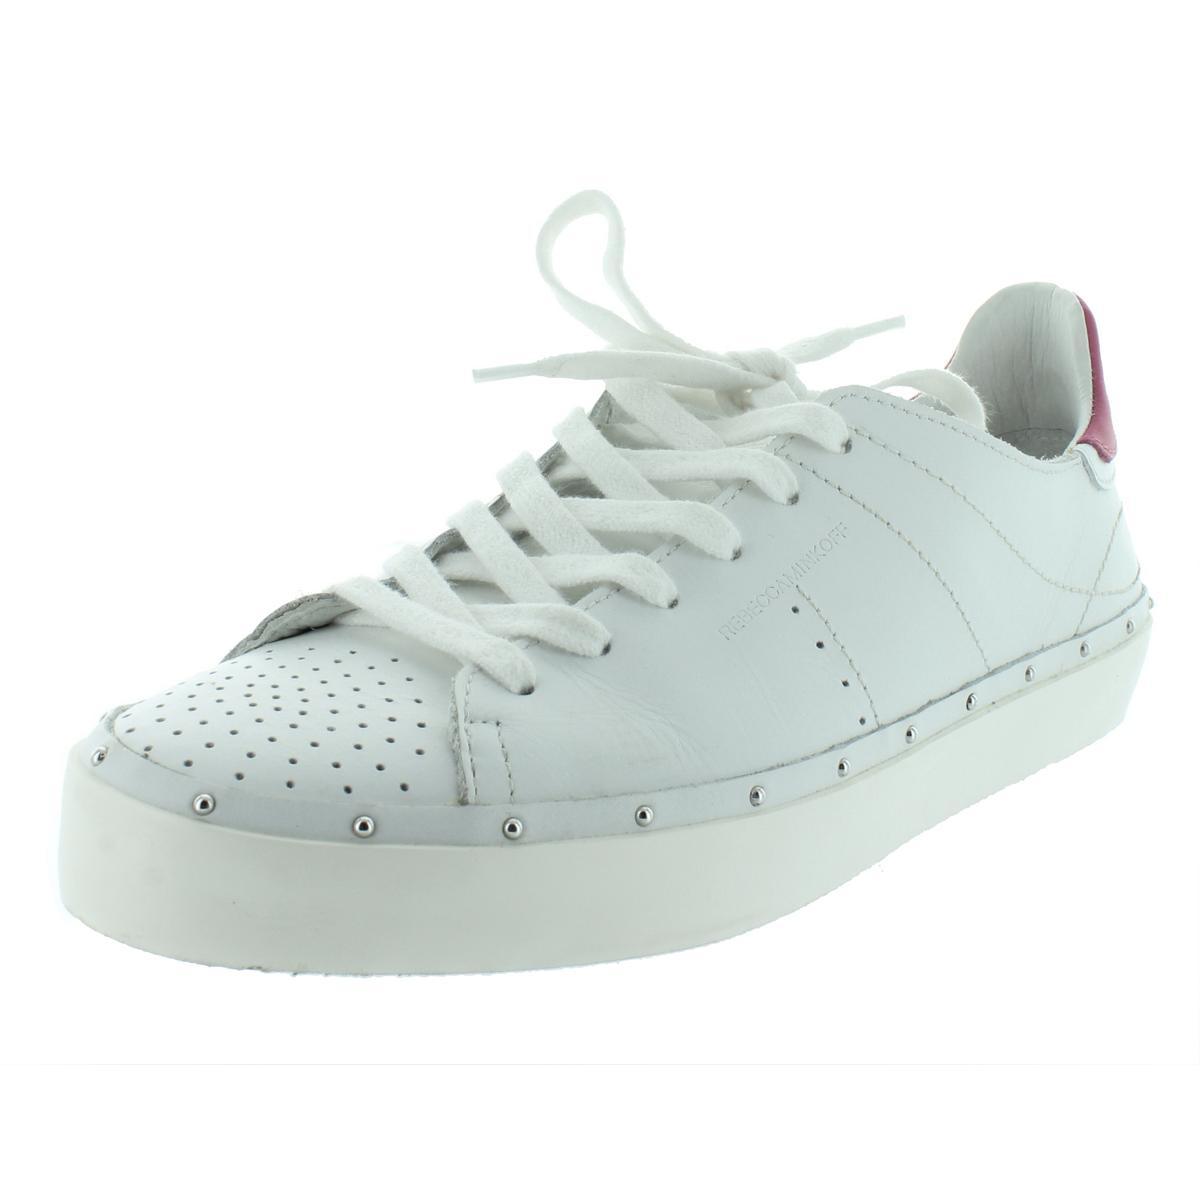 Details about Rebecca Minkoff Womens Michell White Fashion Sneakers 9  Medium (B 662e432eea2